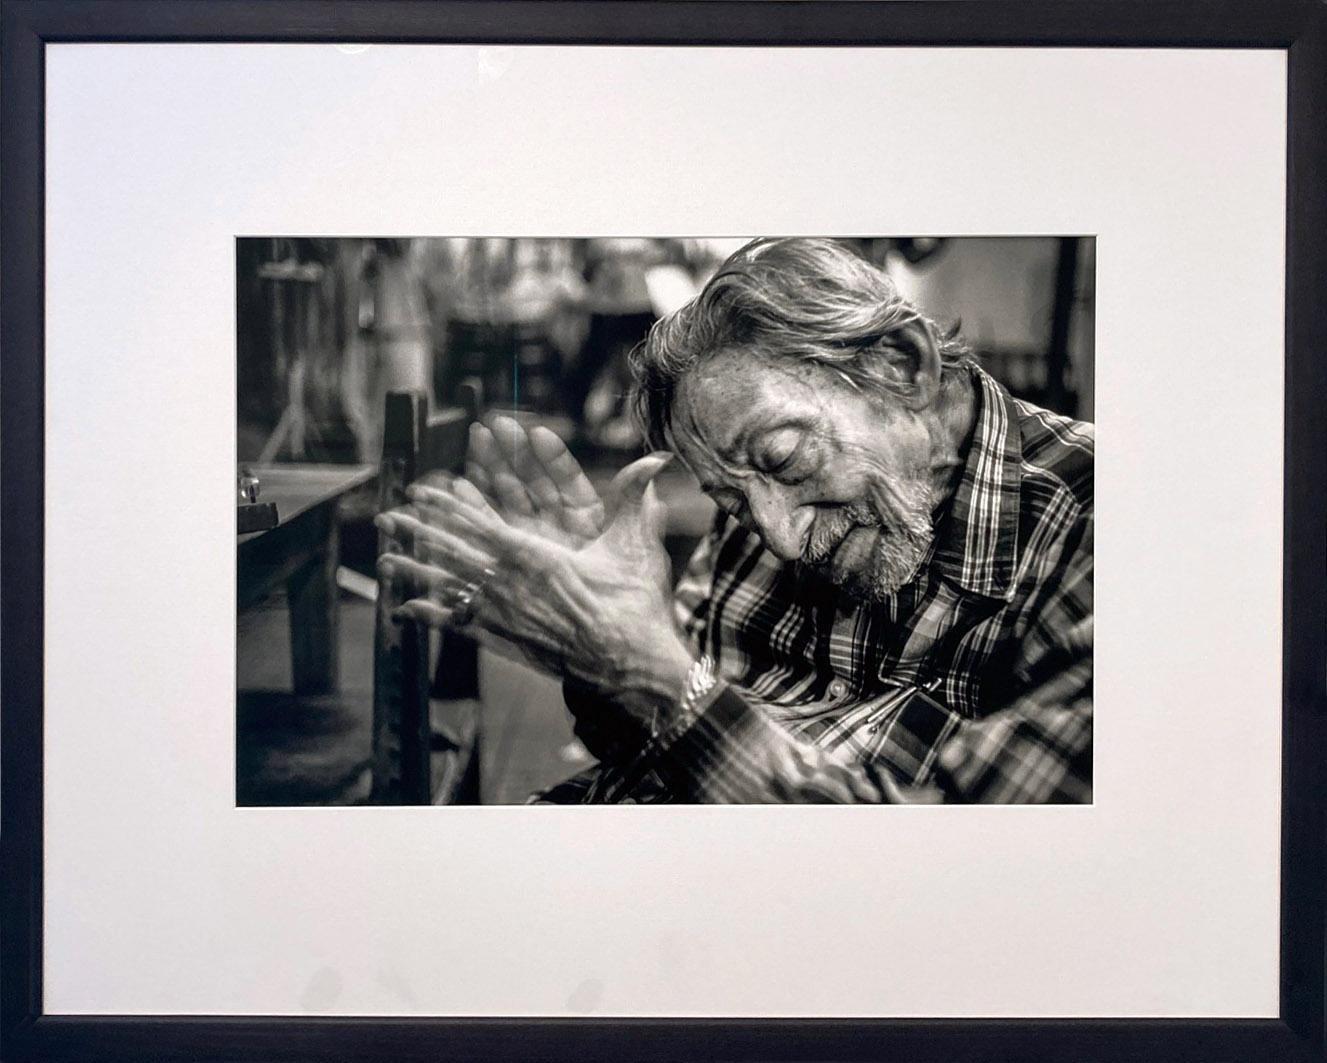 Dagoberto by James Sparshatt. Photography, Gelatin Print with Wood Frame, 2004